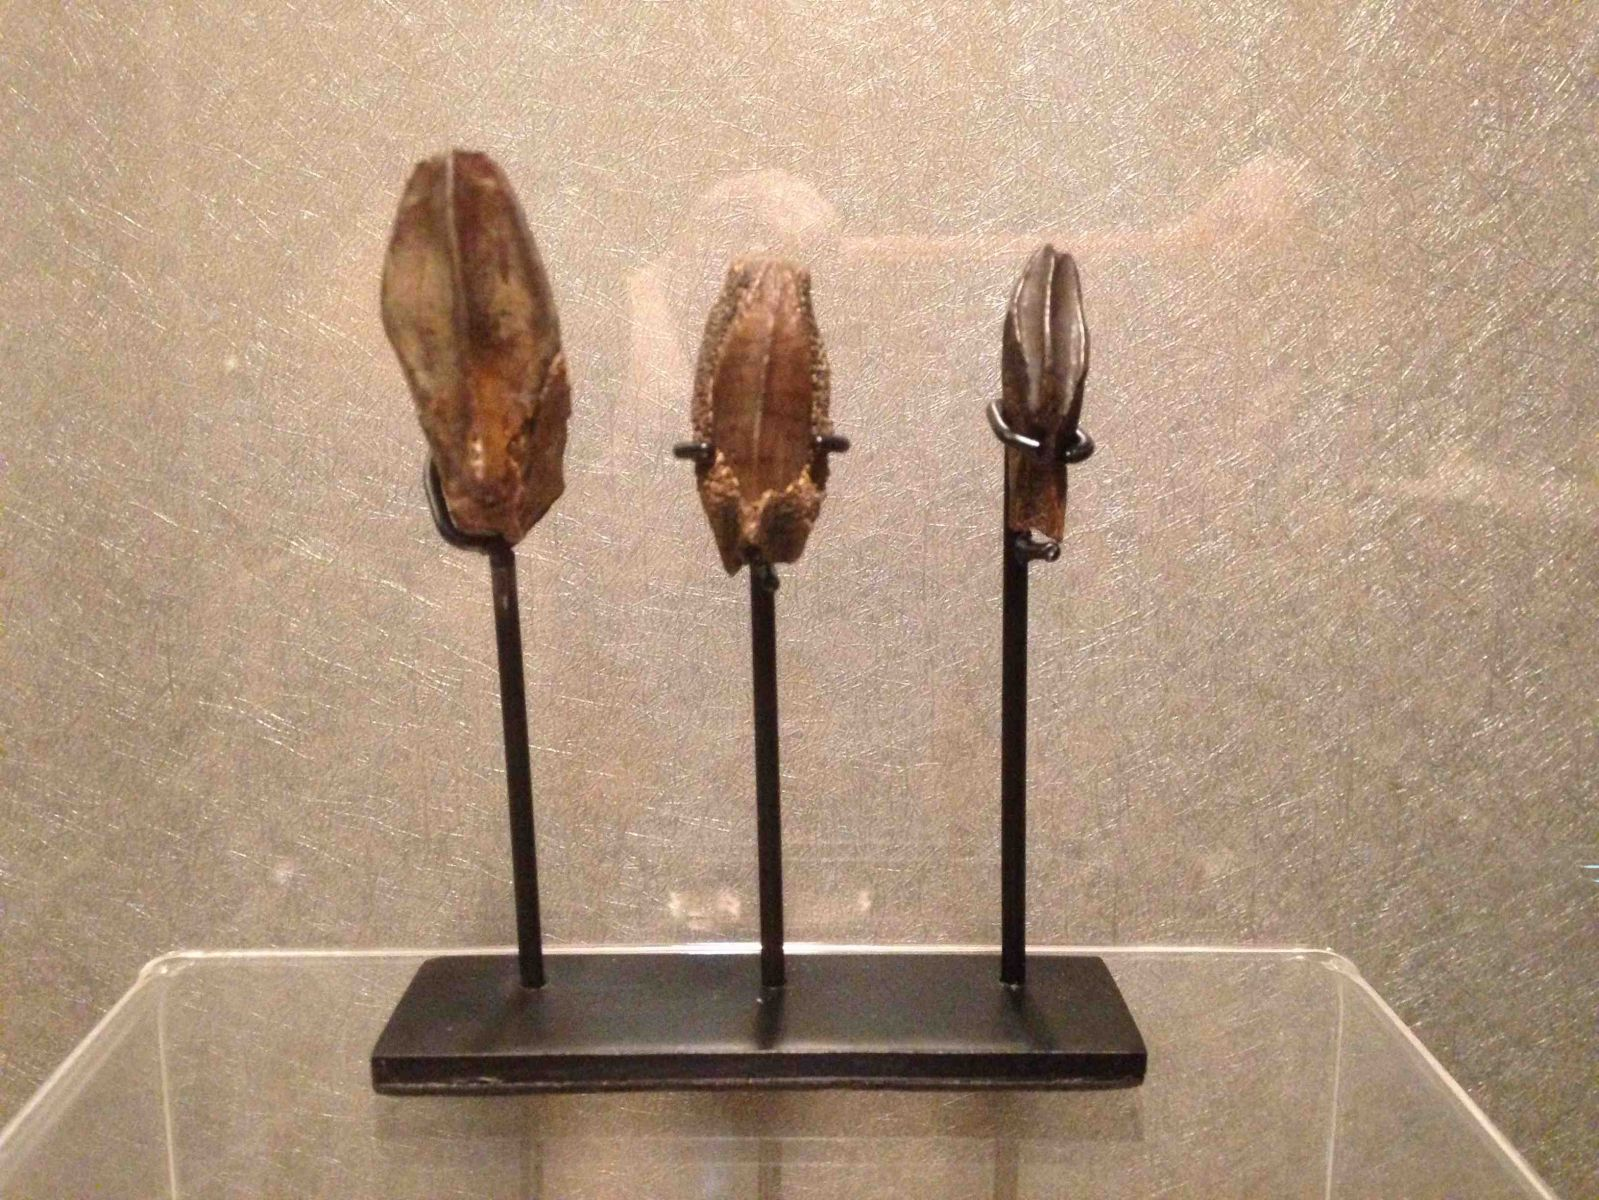 Hadrosaur teeth growth series